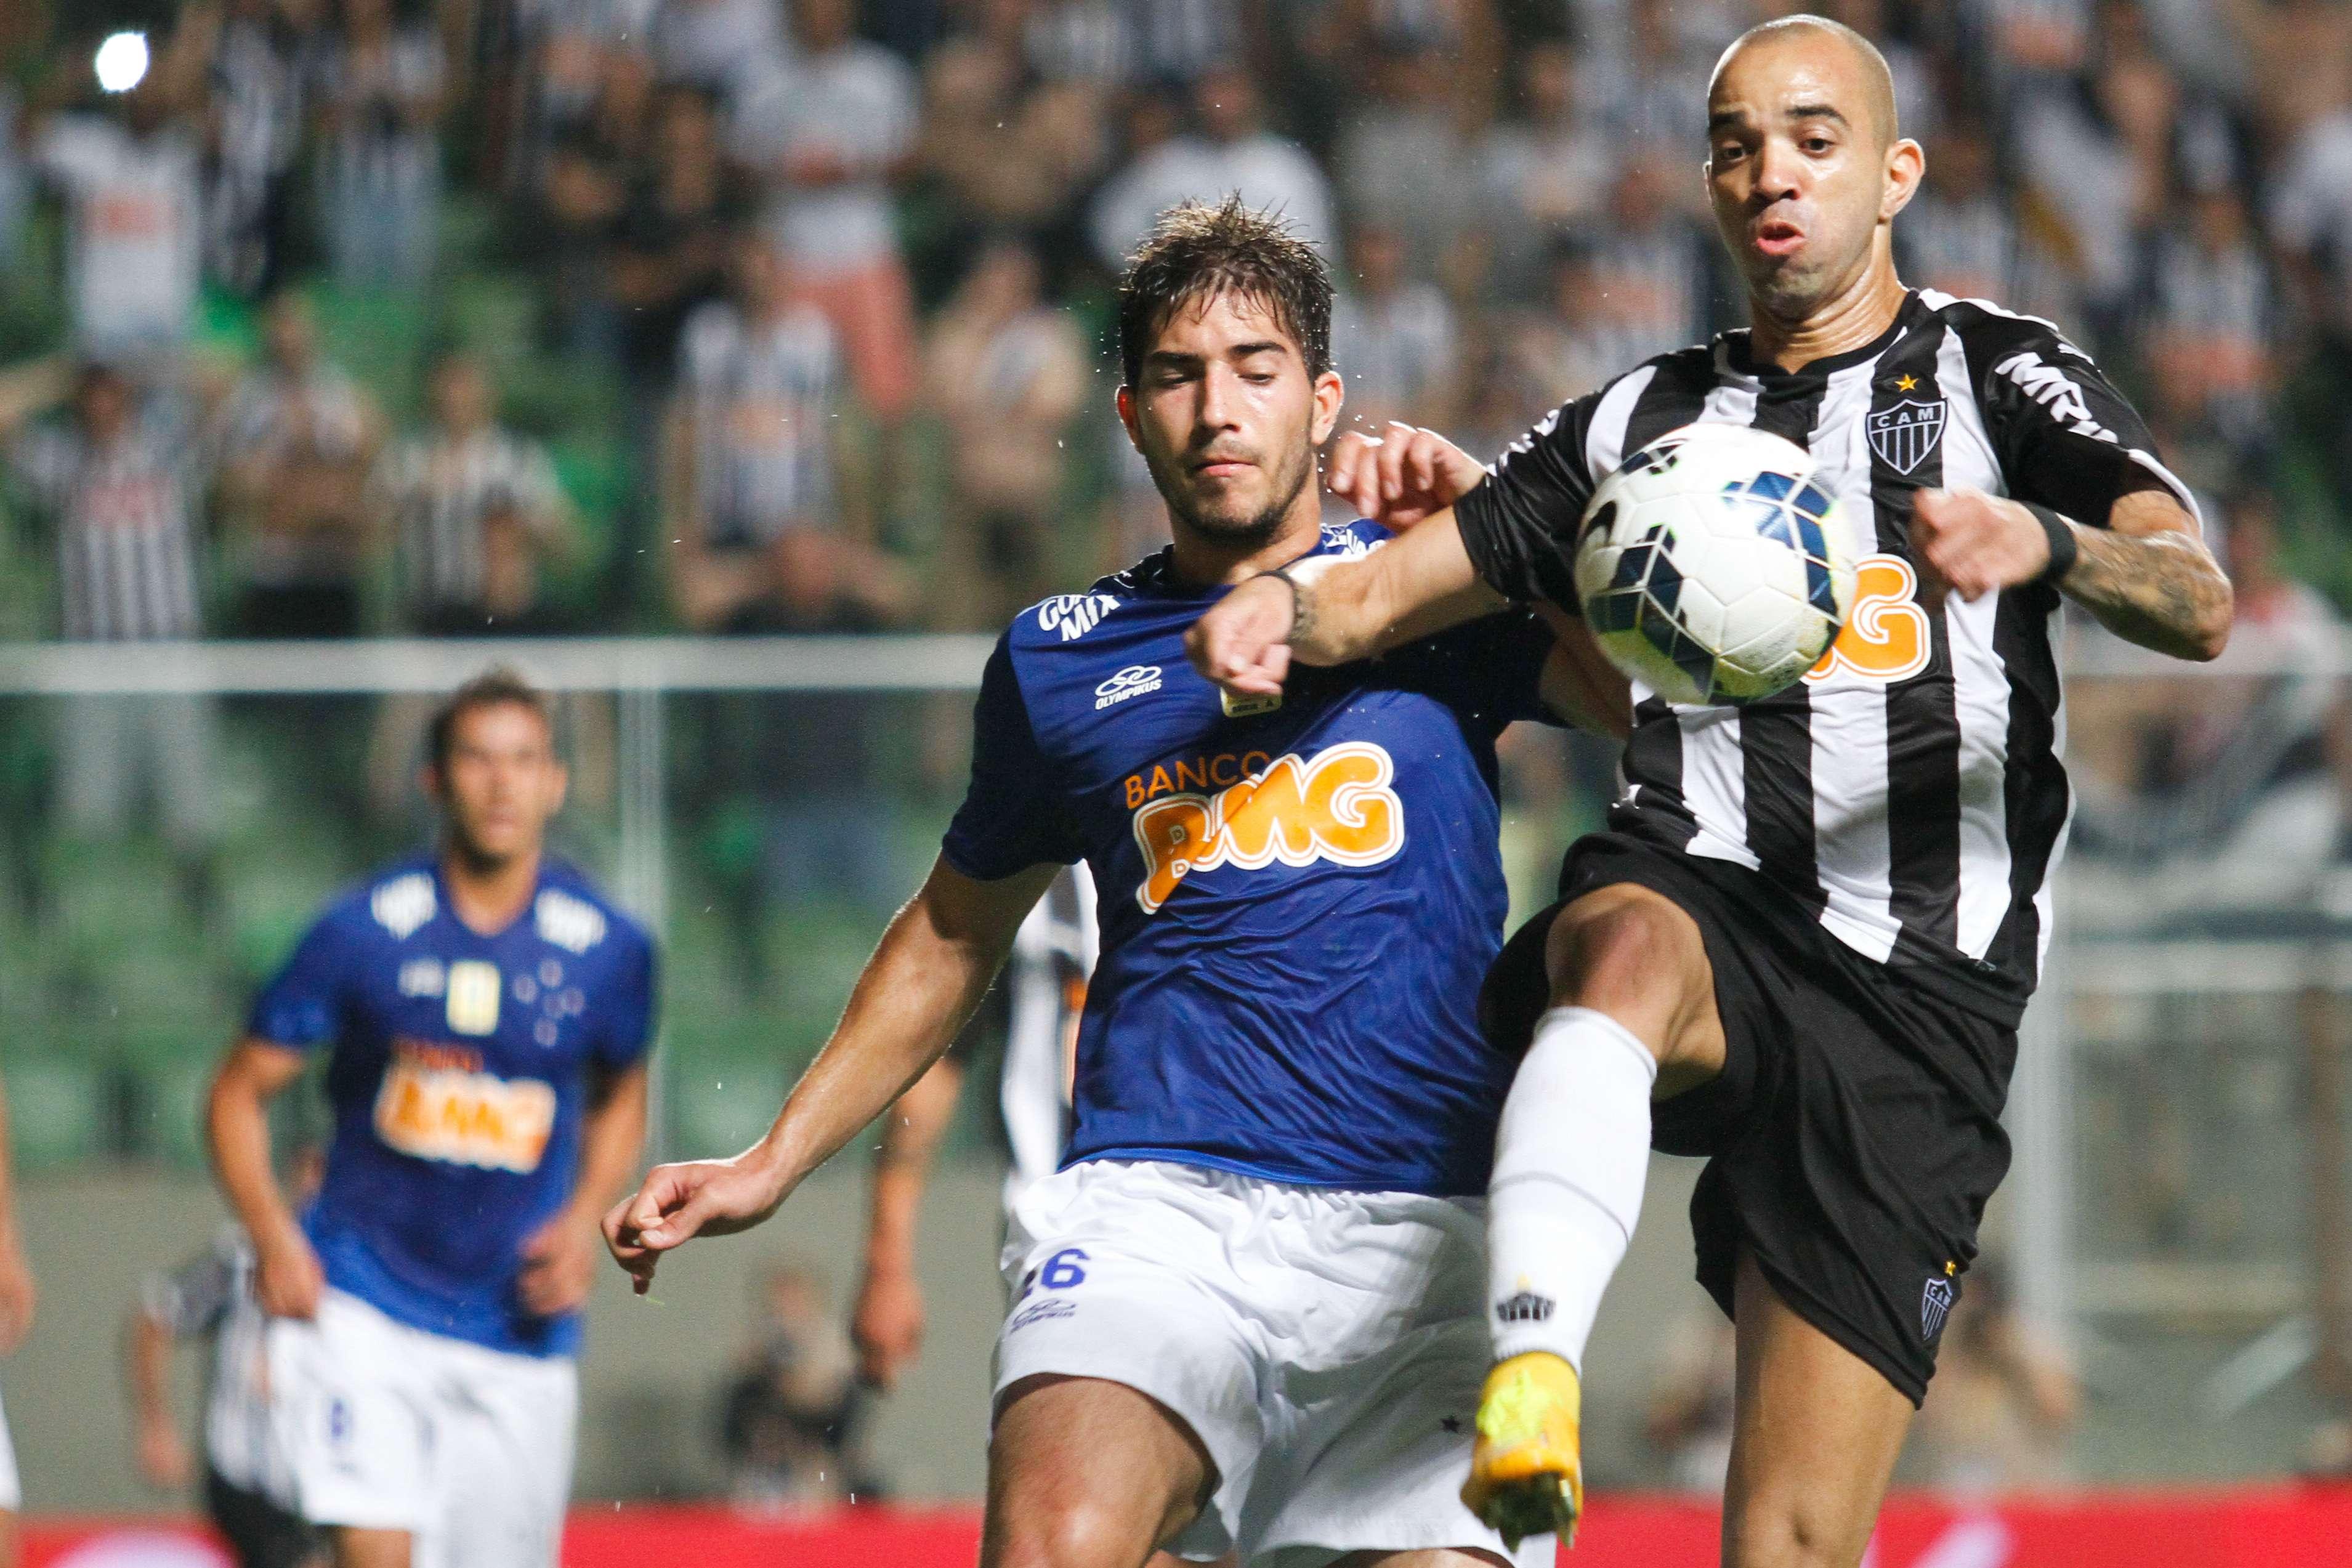 Diego Tardelli e Lucas Silva disputam bola em final Foto: Ramon Bittencourt/Agência Lance